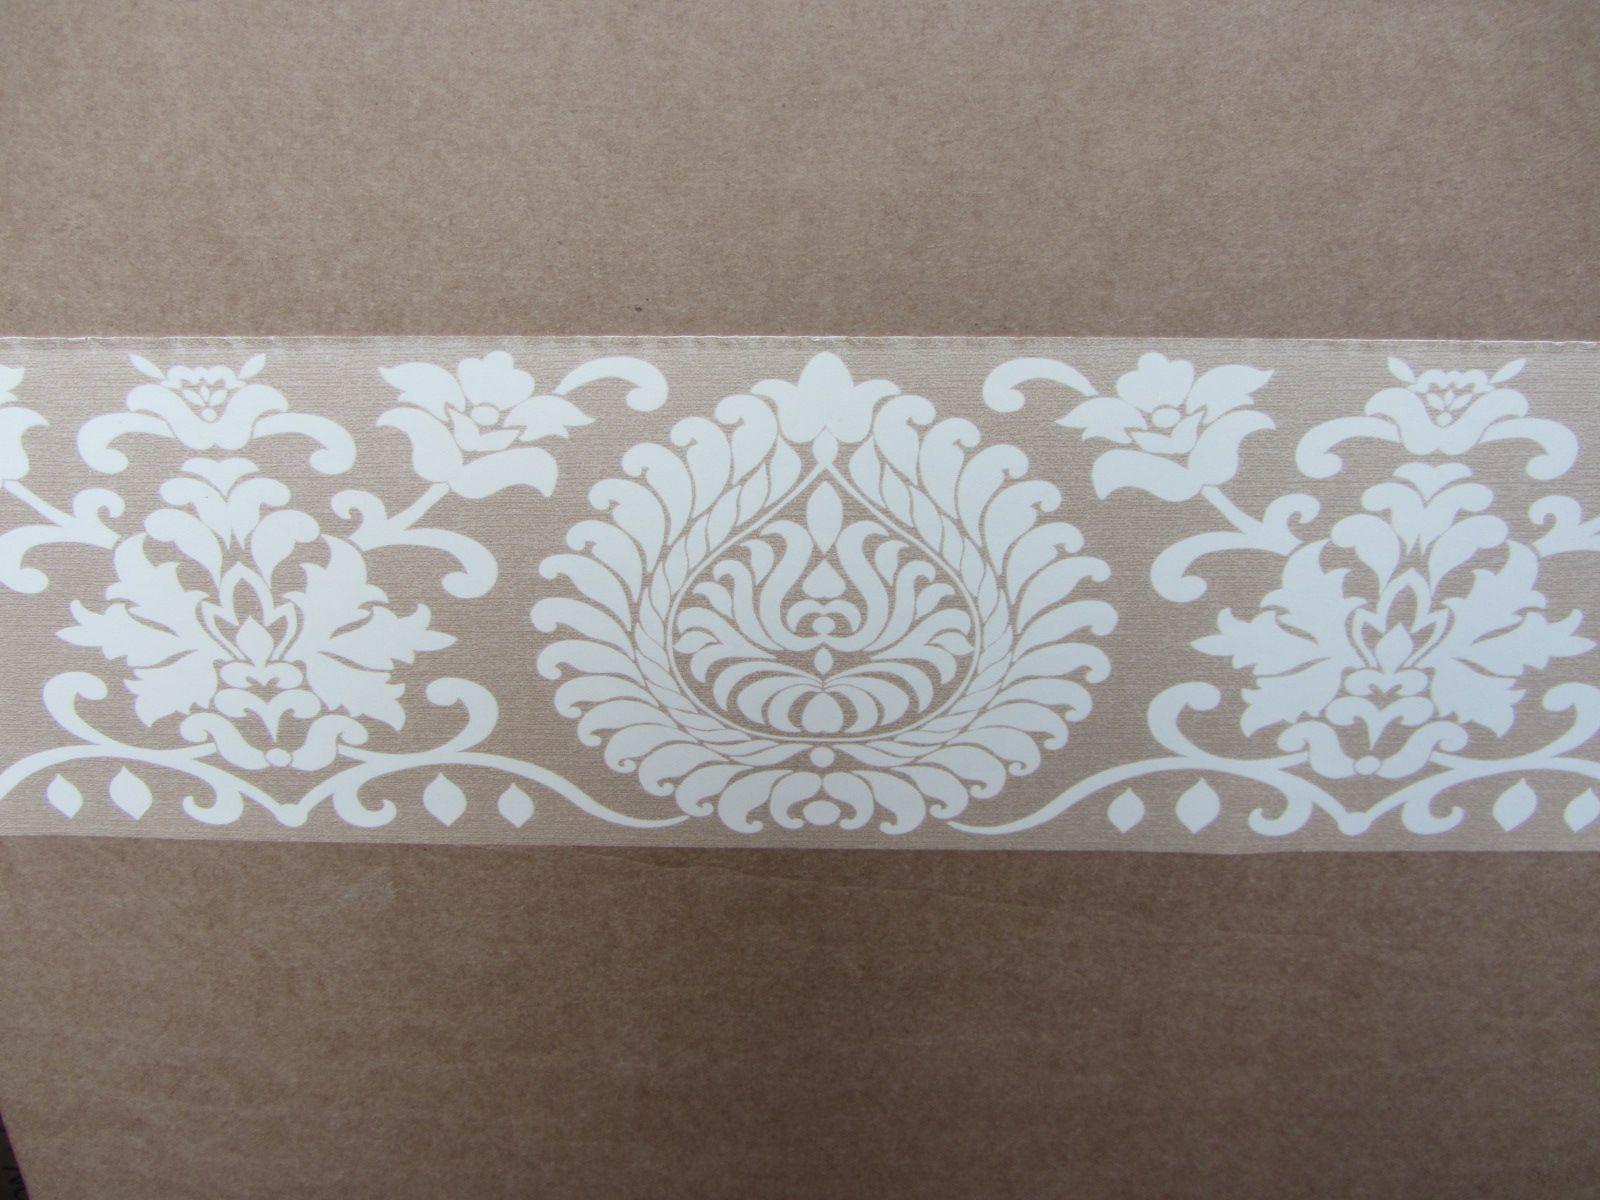 Kitchen wallpaper border  Damask beige wallpaper border pattern modern self adhesive decorate